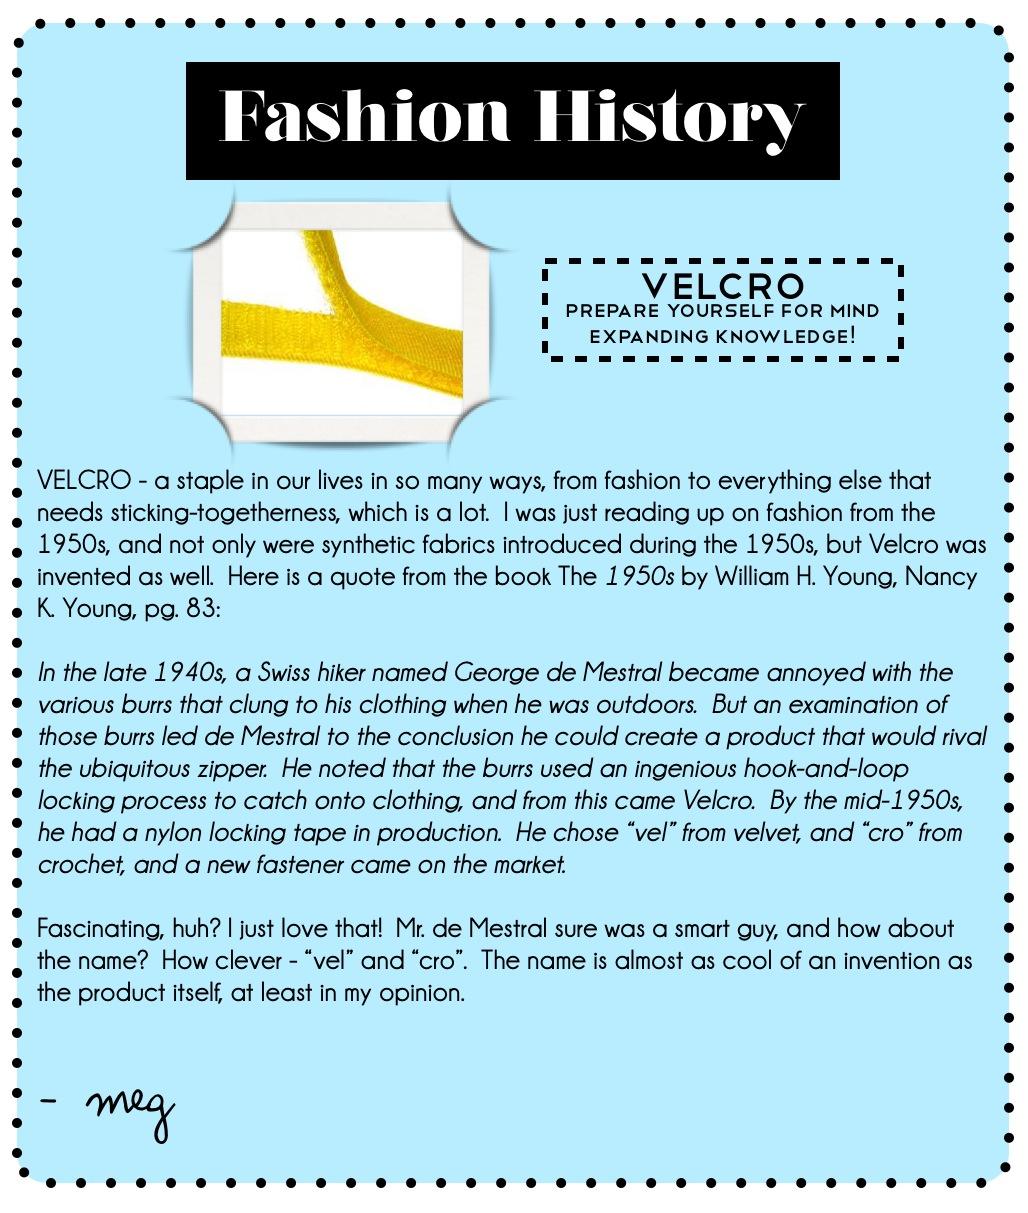 velcro history